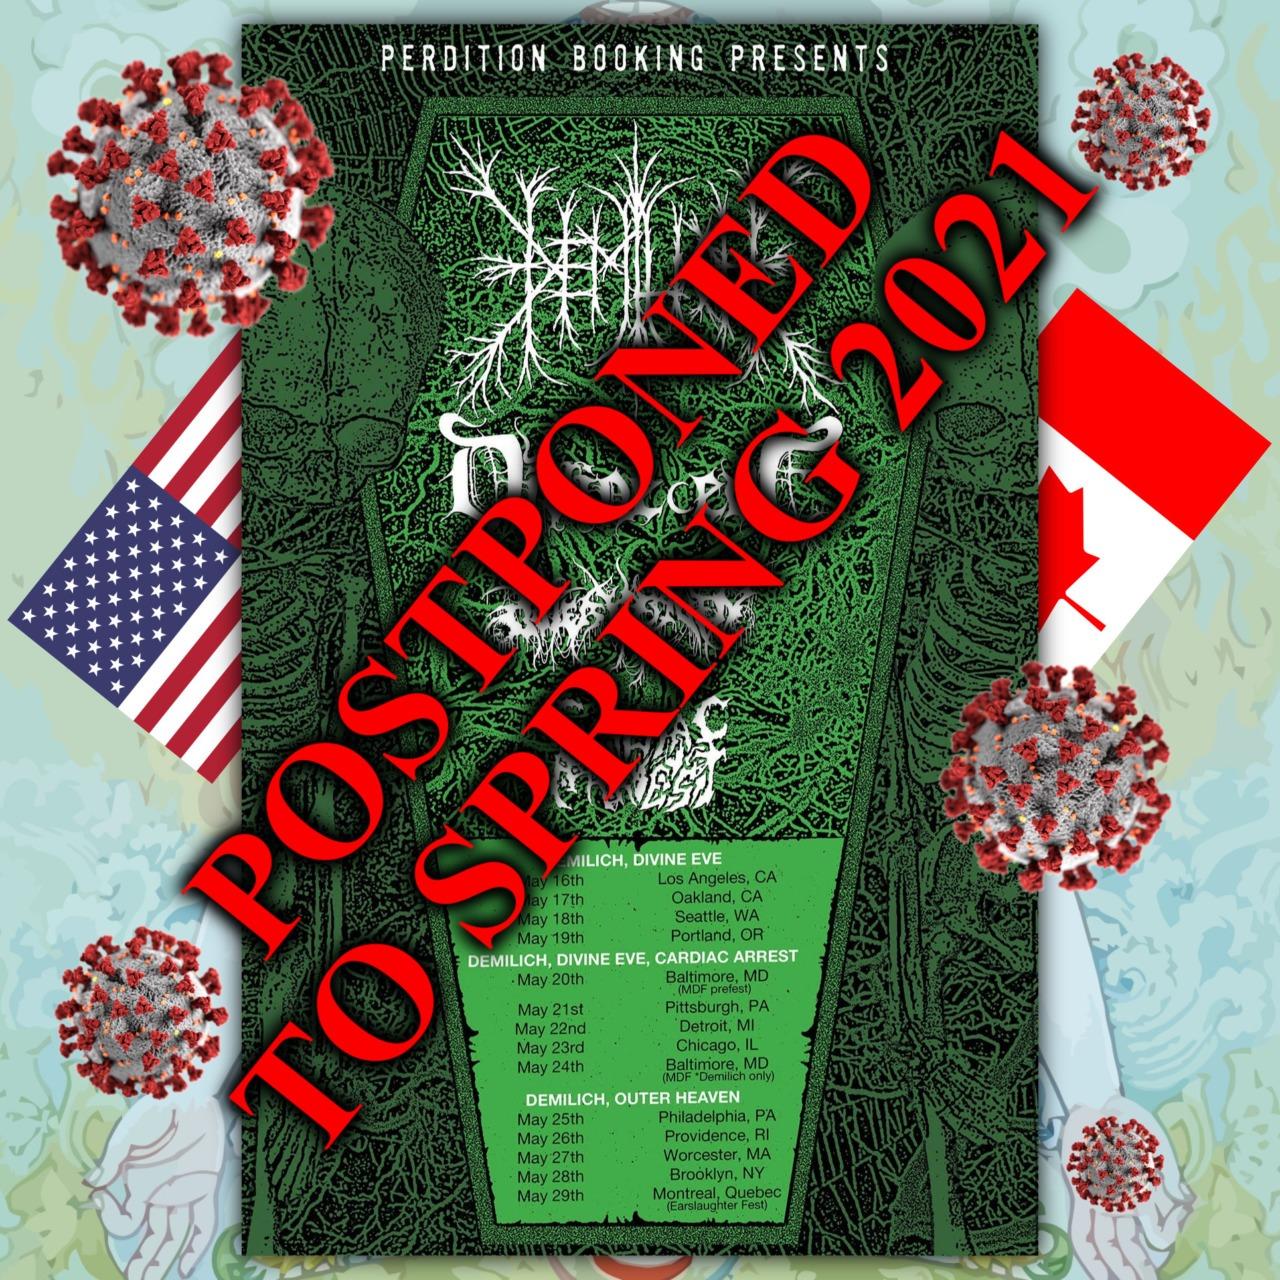 Demilich postpones the North America tour to spring 2021